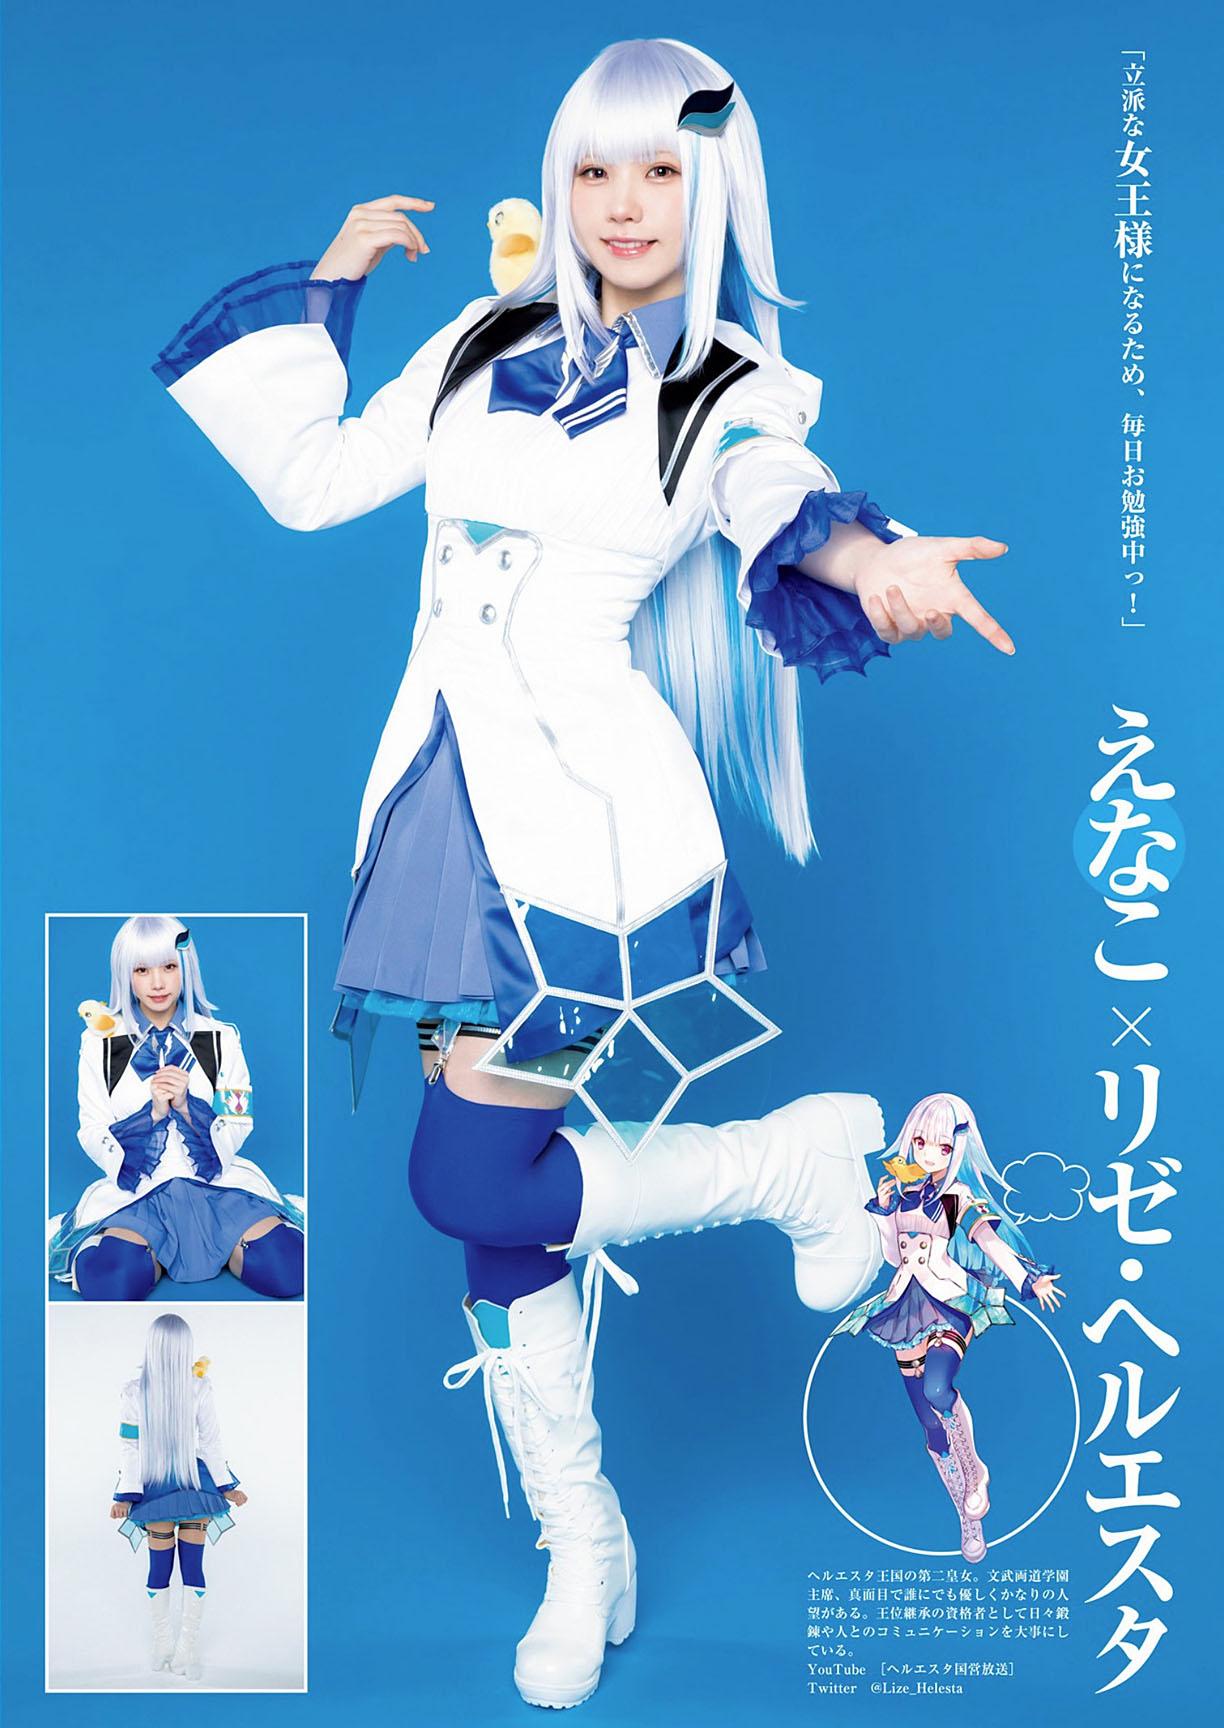 Enako Young Jump 210325 15.jpg